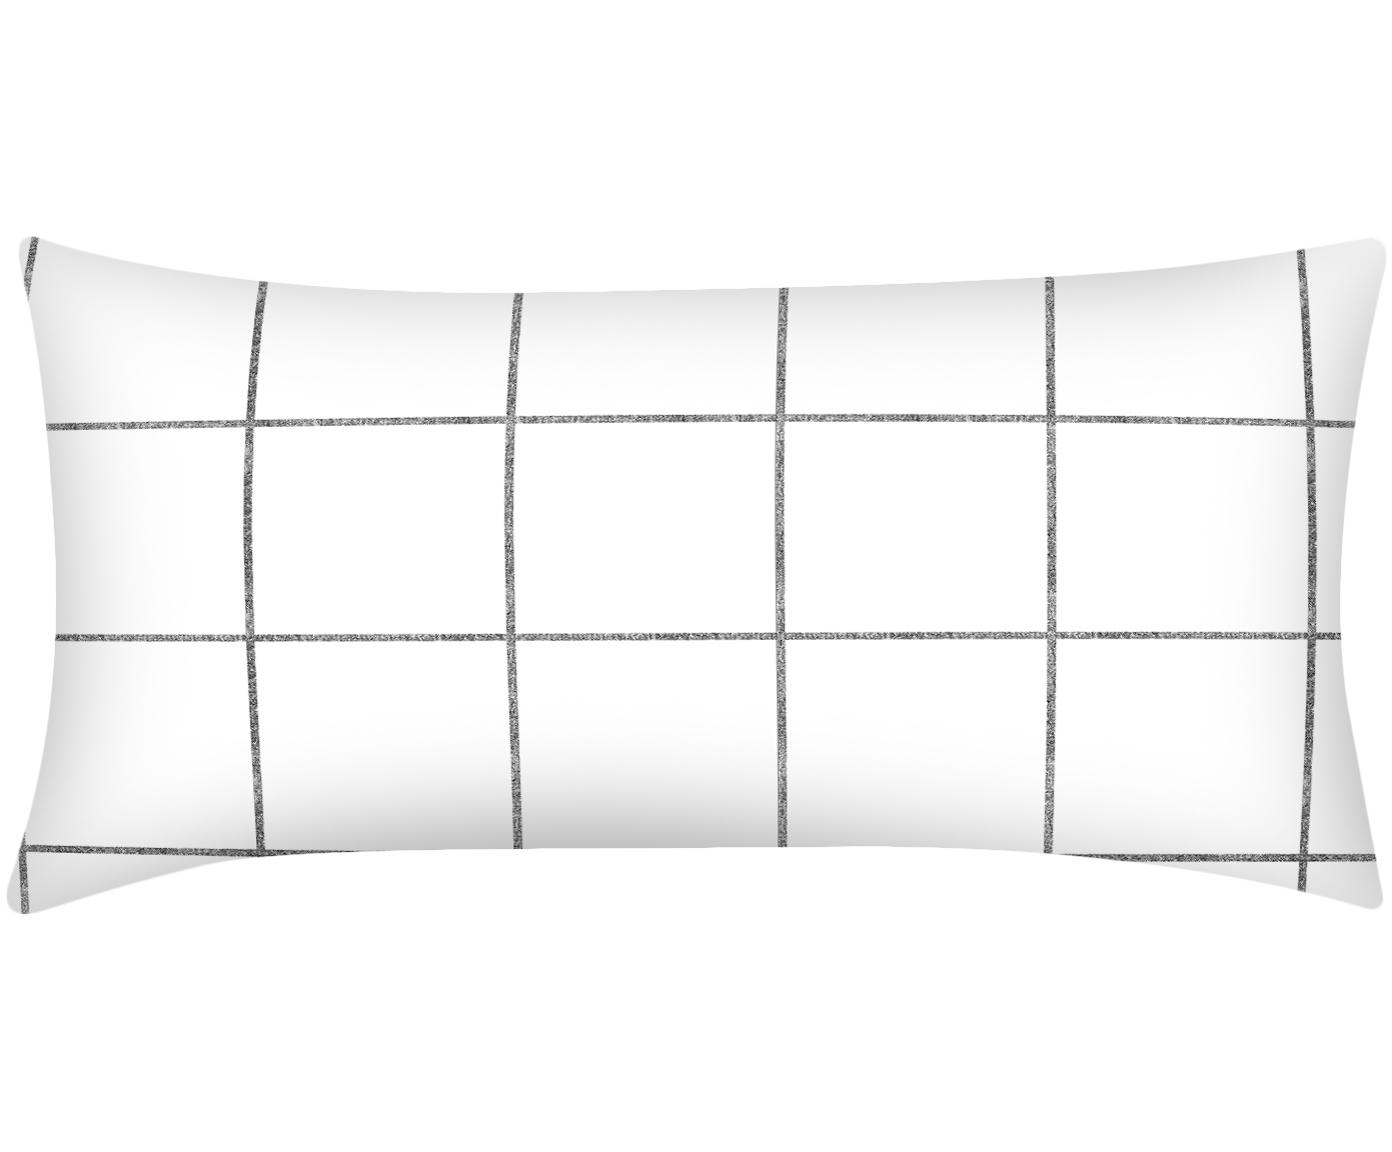 Karierte Baumwollperkal-Kissenbezüge Juna in Schwarz/Weiß, 2 Stück, Webart: Perkal Fadendichte 180 TC, Weiß, Schwarz, 40 x 80 cm